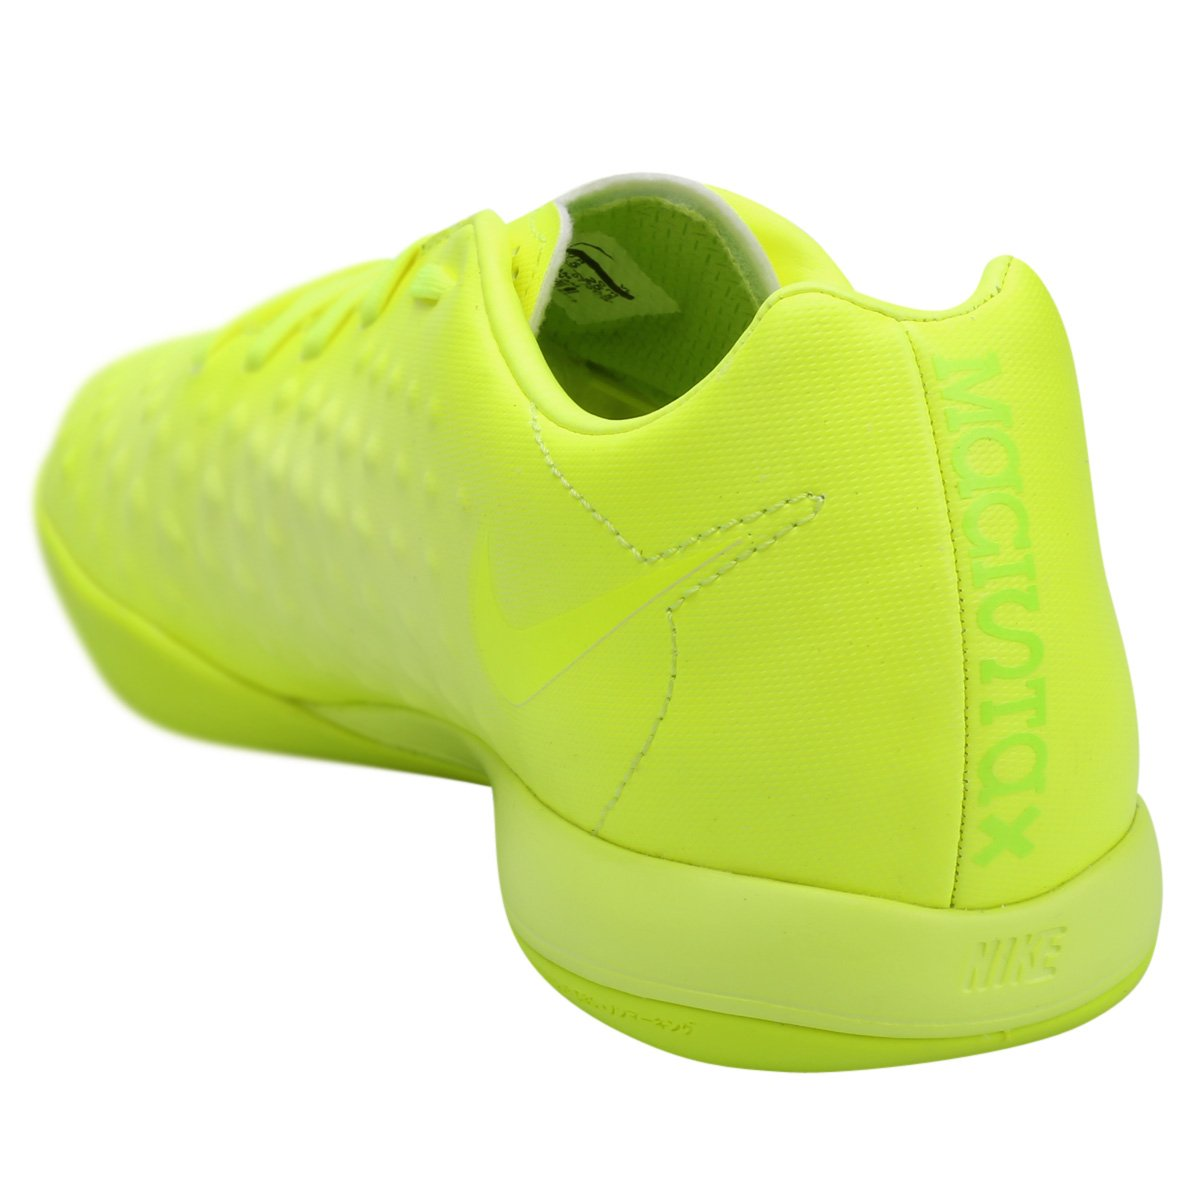 4d90f3c837 Chuteira Futsal Nike Magista Onda II IC - Compre Agora